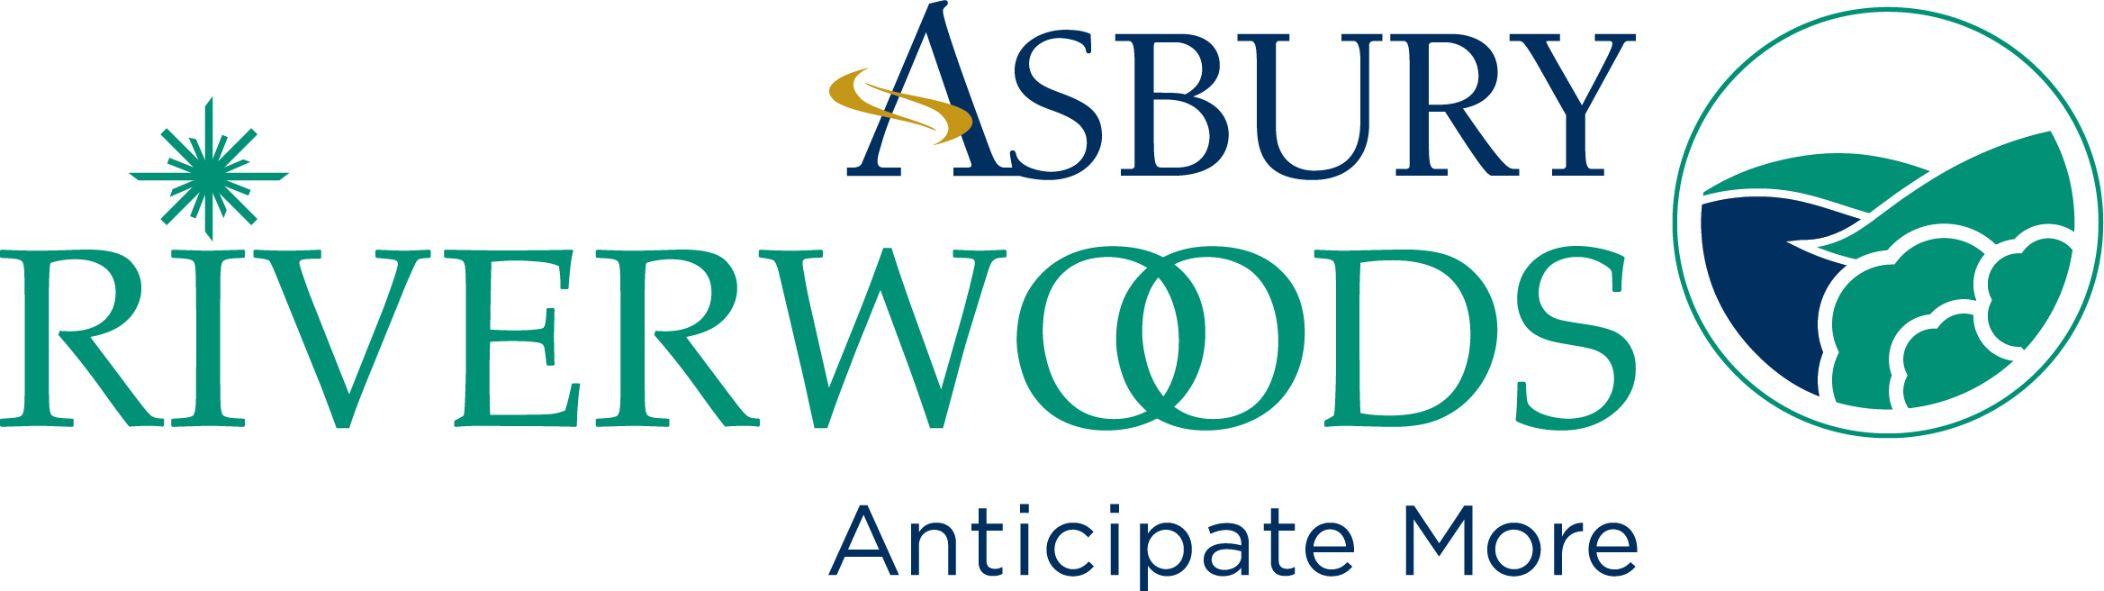 Riverwoods logo